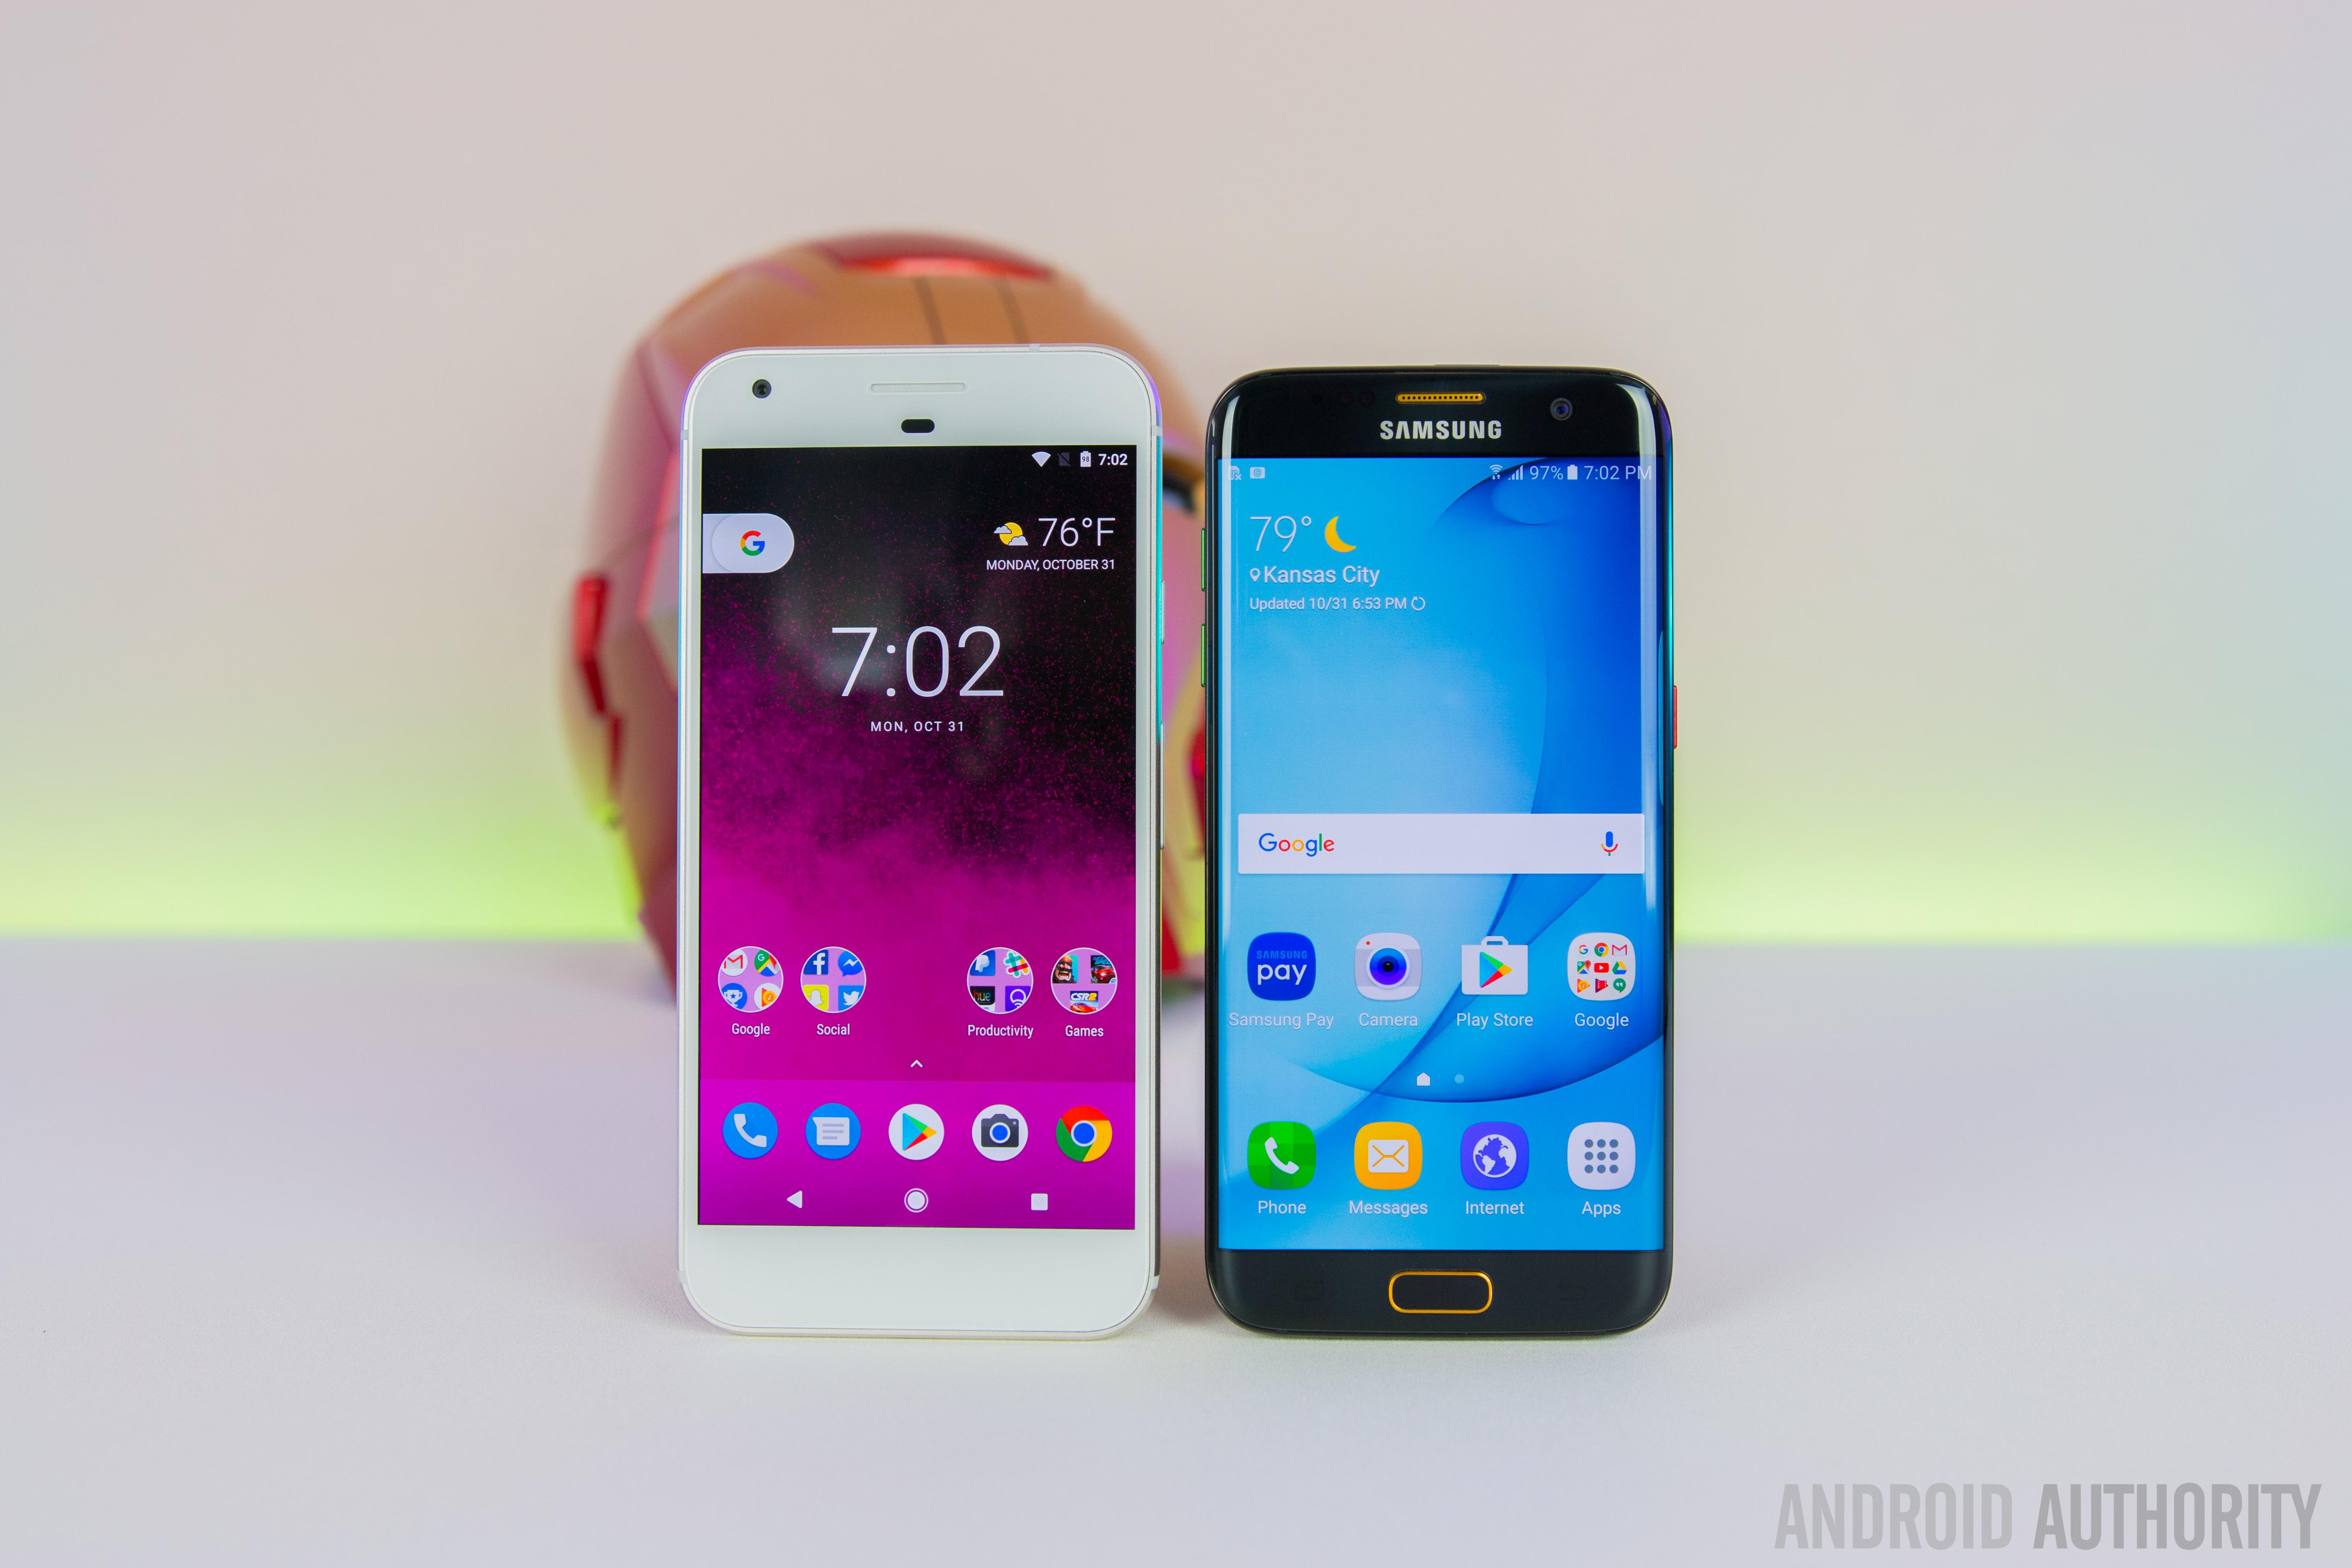 Samsung Galaxy S7 S7 Edge Stock Wallpapers Download: Download The Google Pixel Stock Wallpaper Here